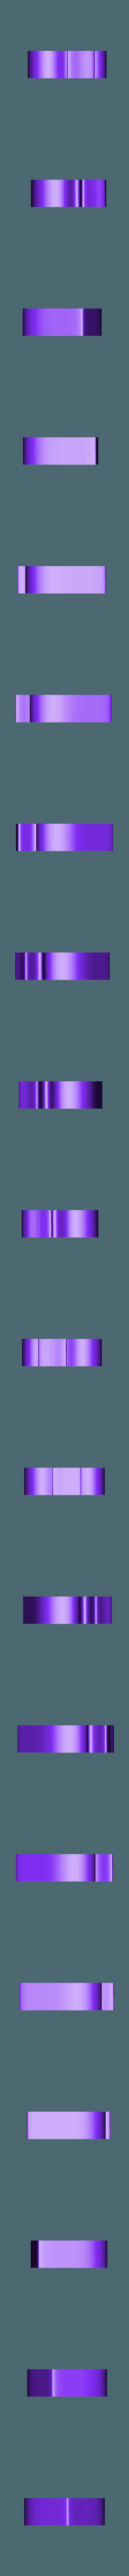 SpadeSOLID.stl Download free STL file Cards Cookie Cutters (4 Pack) • 3D print design, Jdog